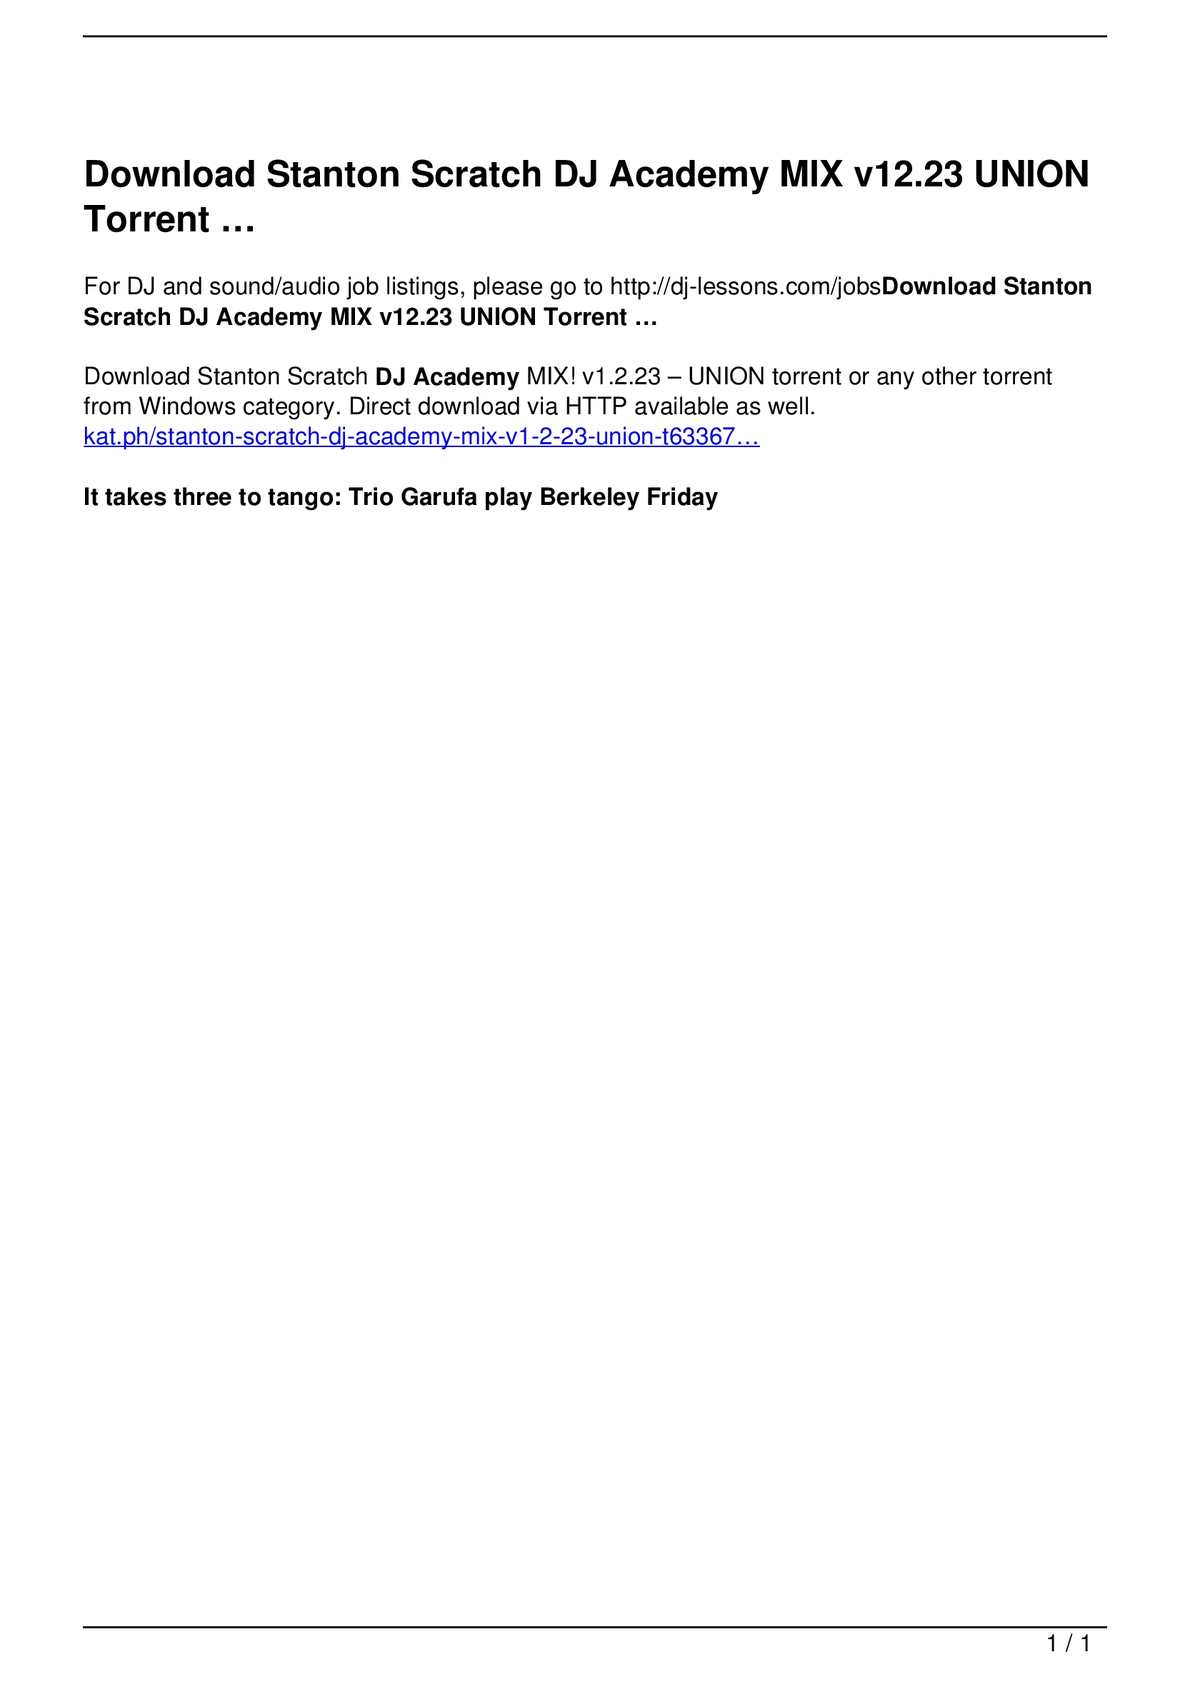 Calaméo - Download Stanton Scratch DJ Academy MIX v12 23